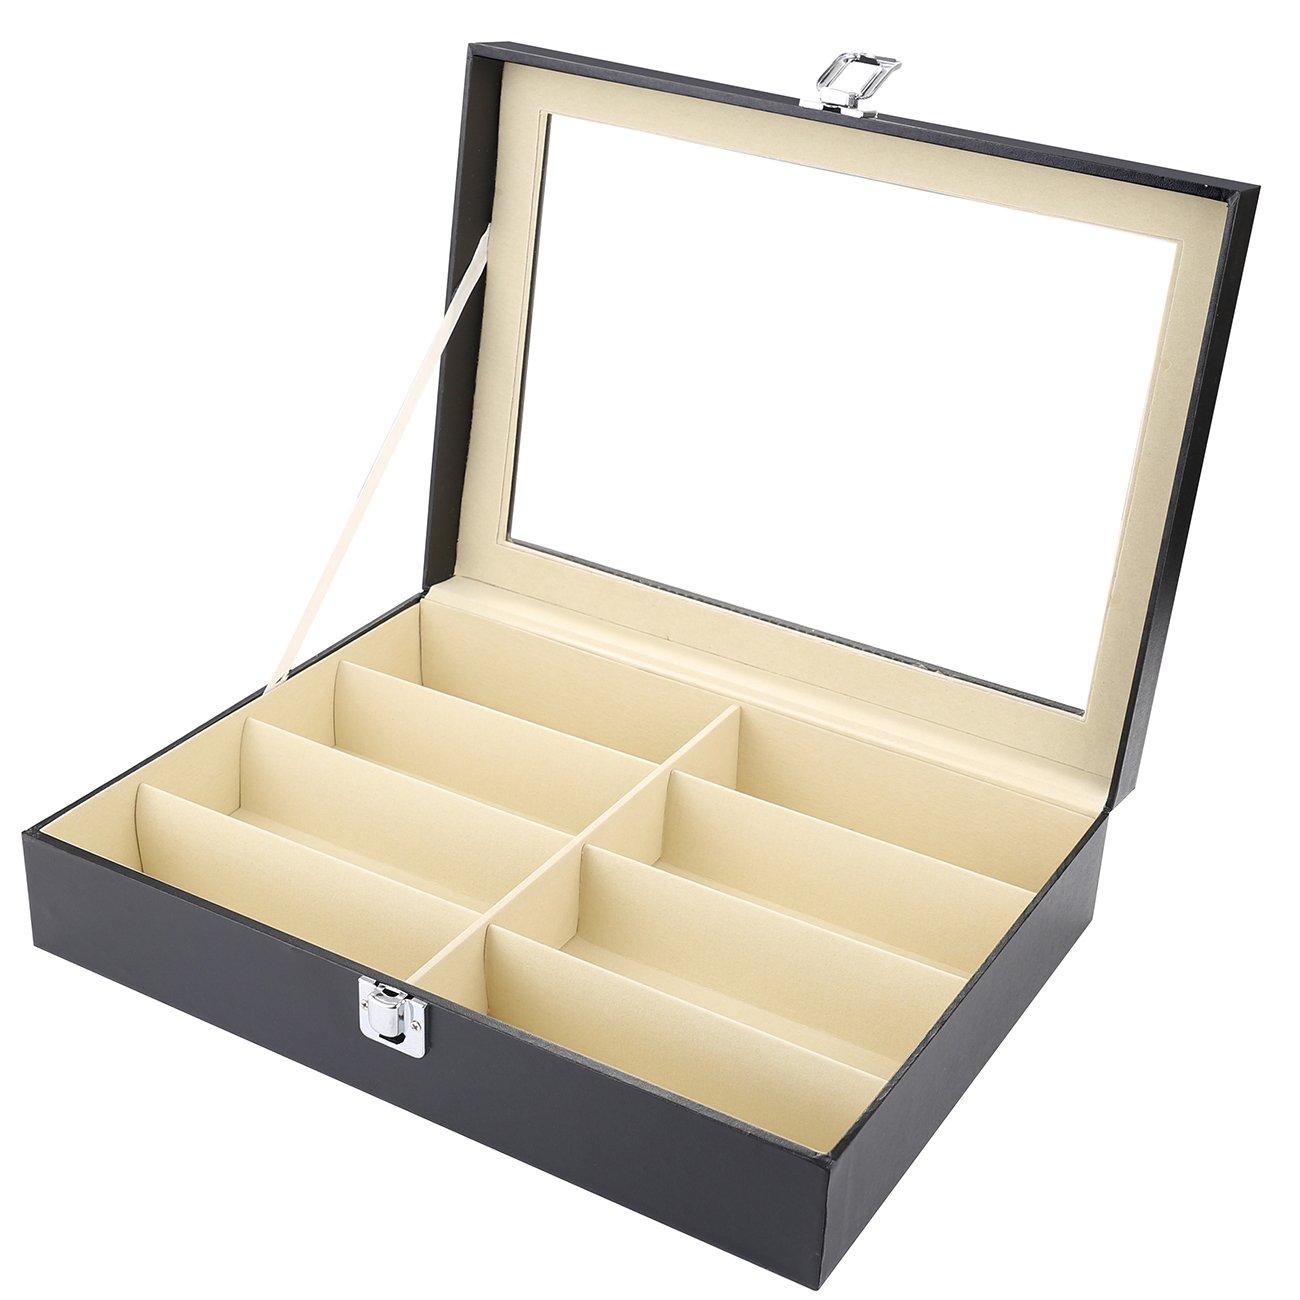 UYGHHK 8 Slot Eyeglass Sunglass Storage Box, PU Leather Glasses Display Case Eyewear Organizer Collector – 8 Compartments